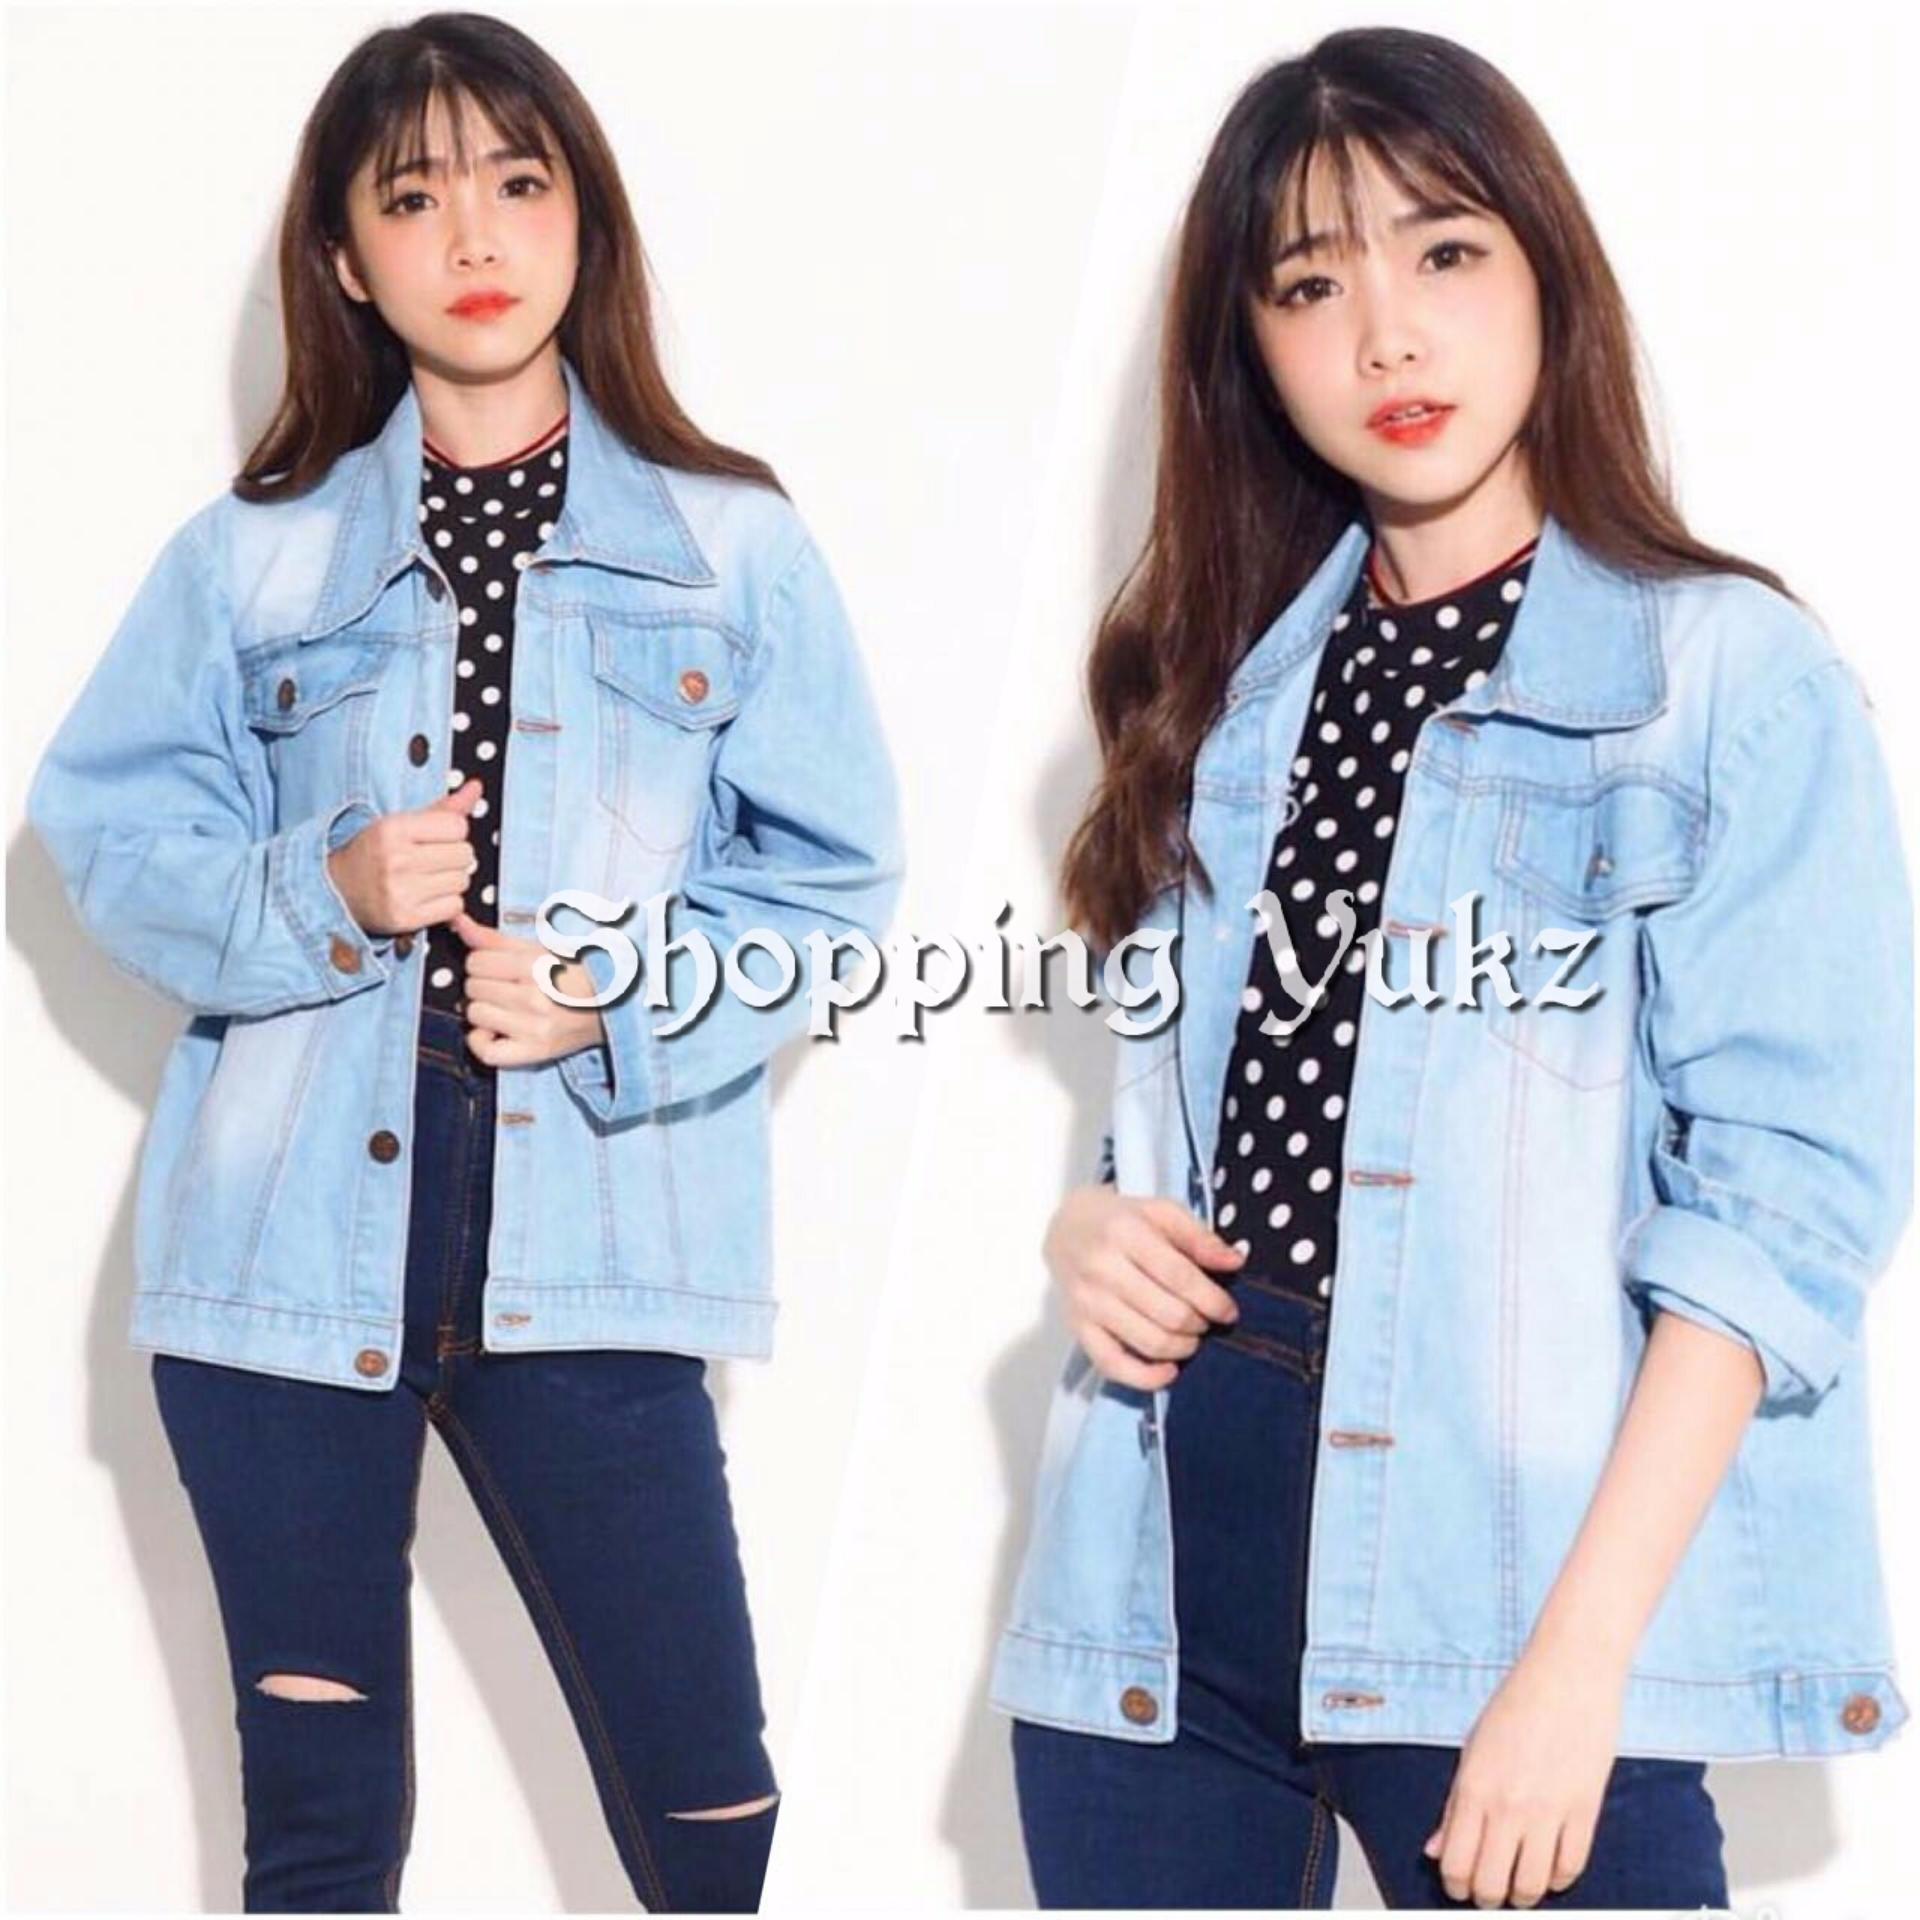 Big Info Harga Promo Produk Terbaru Hanya Untuk Anda Jaket Jeans Wanita Oversize Warna Shopping Yukz Size Rara Soft Blue Kualitas Premium